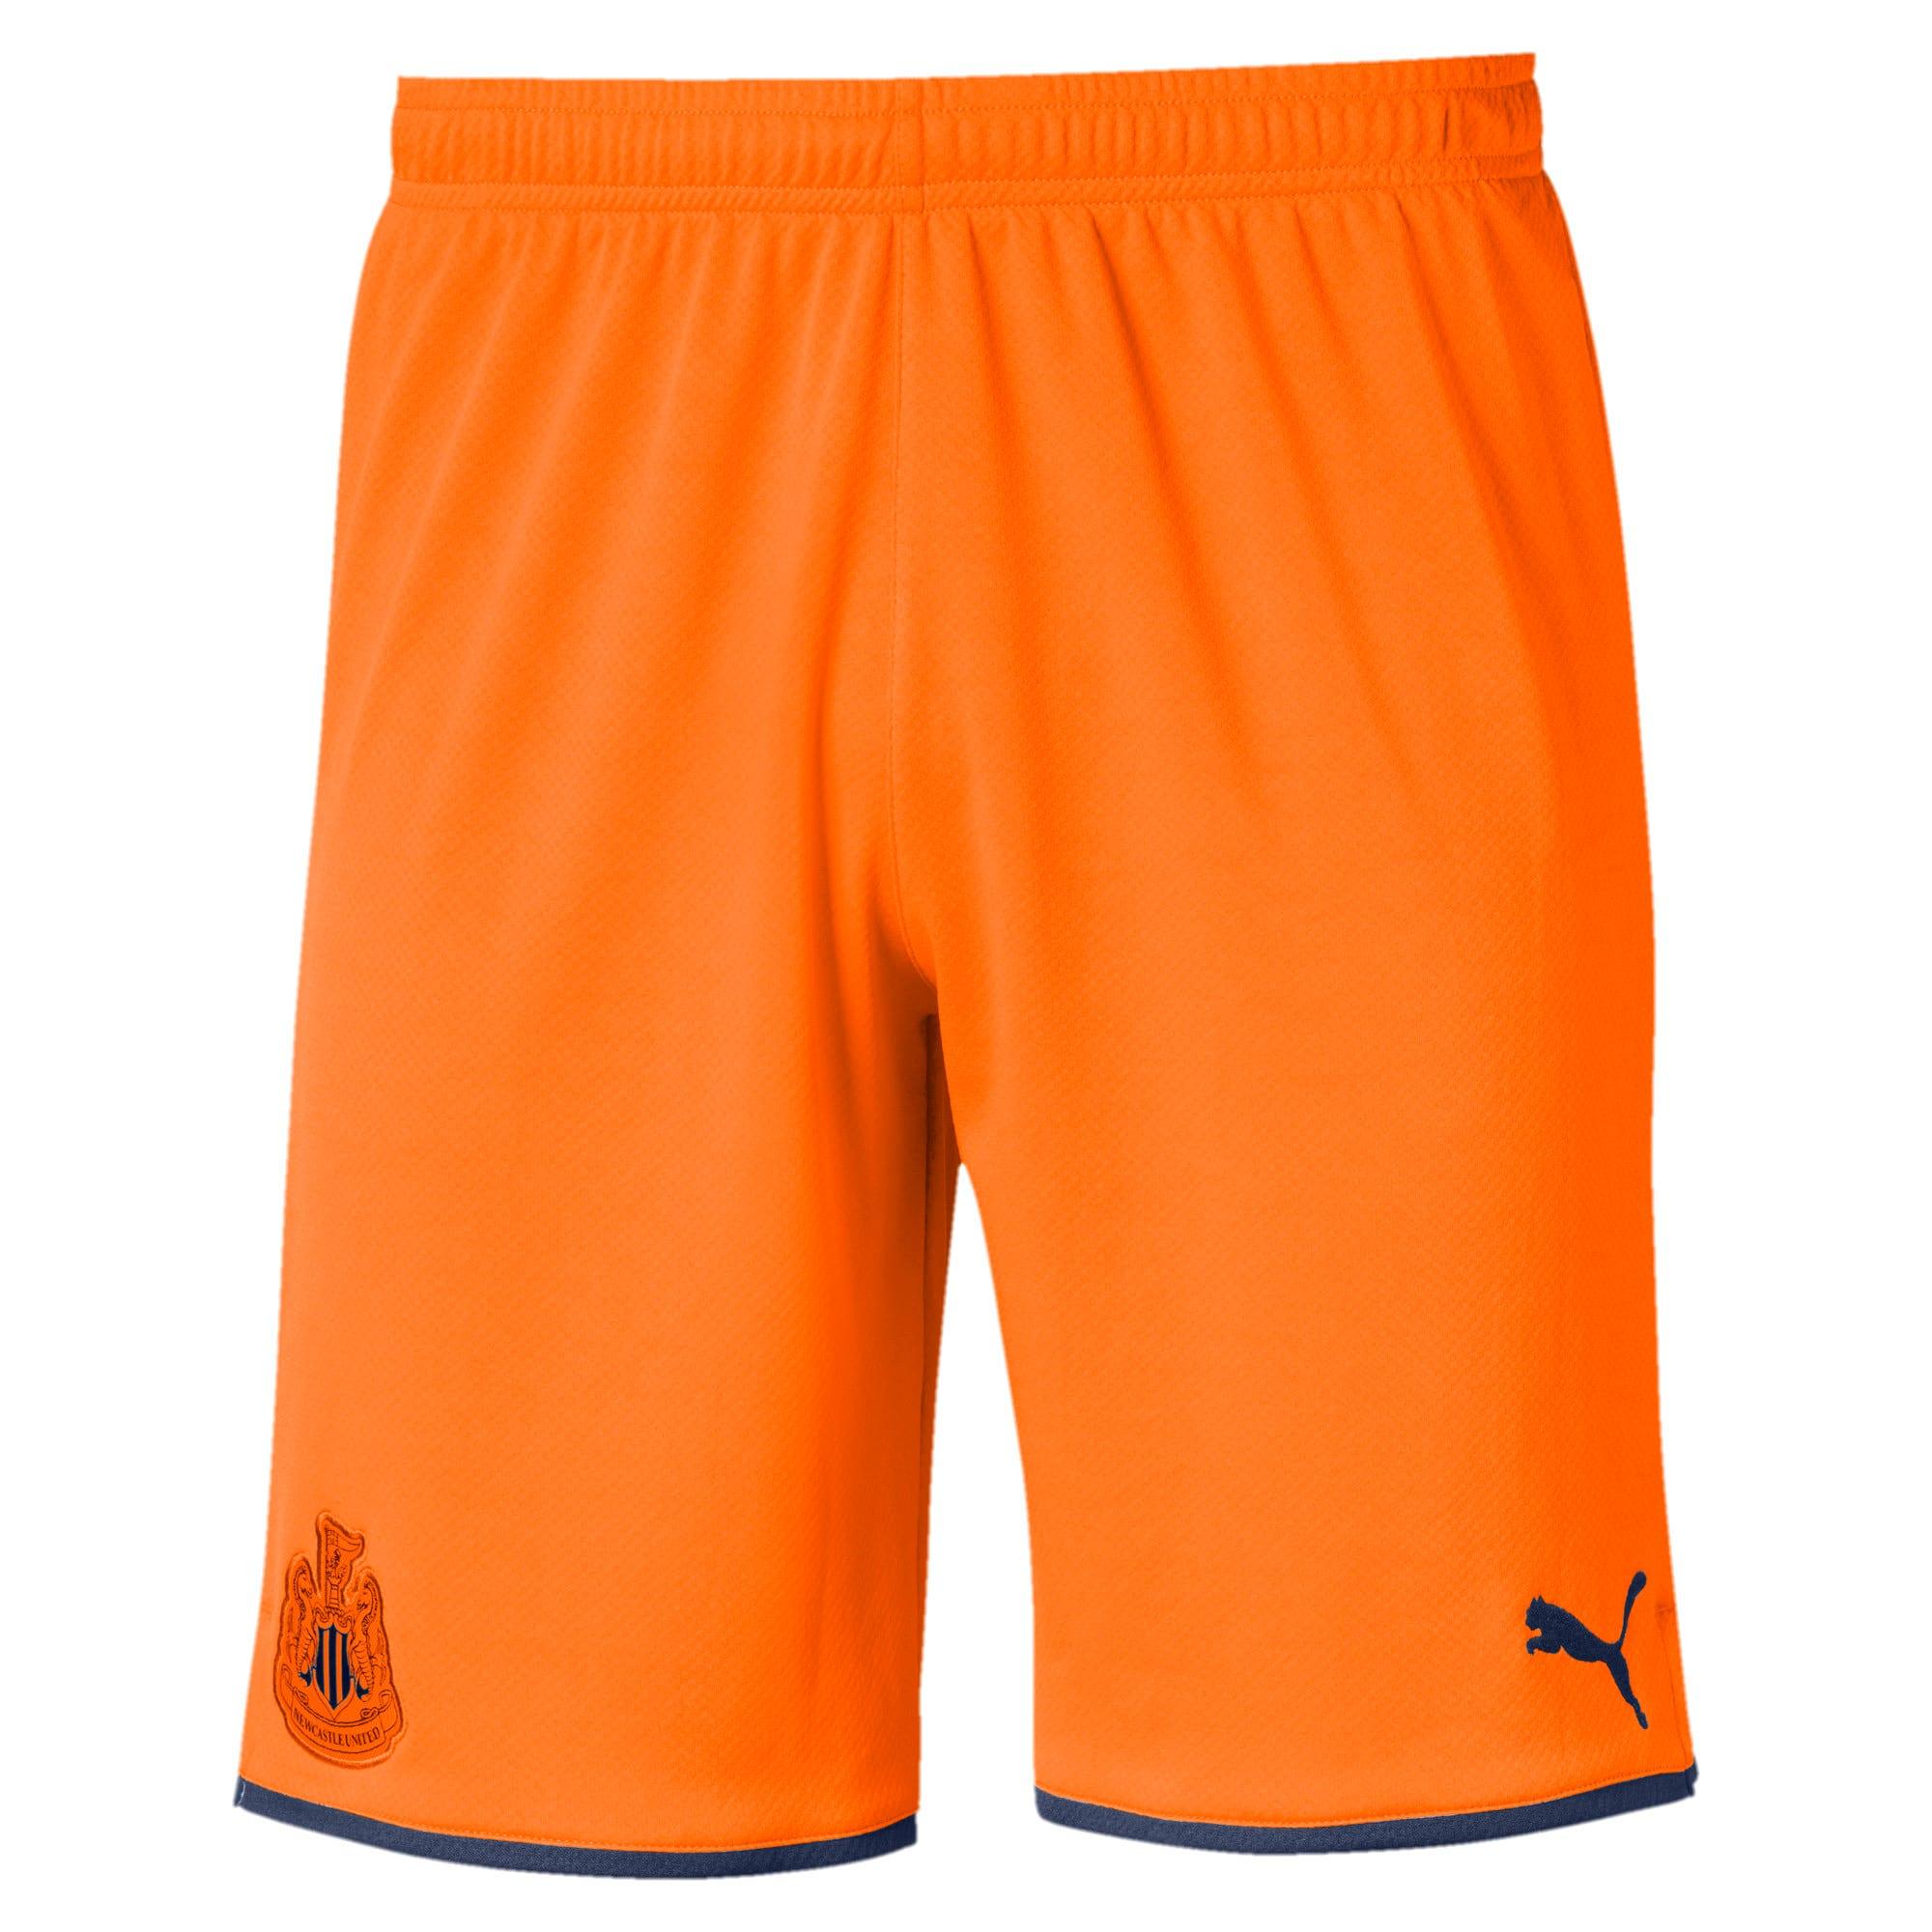 Thumbnail 1 of Newcastle United FC Men's Replica Shorts, Vibrant Orange-Peacoat, medium